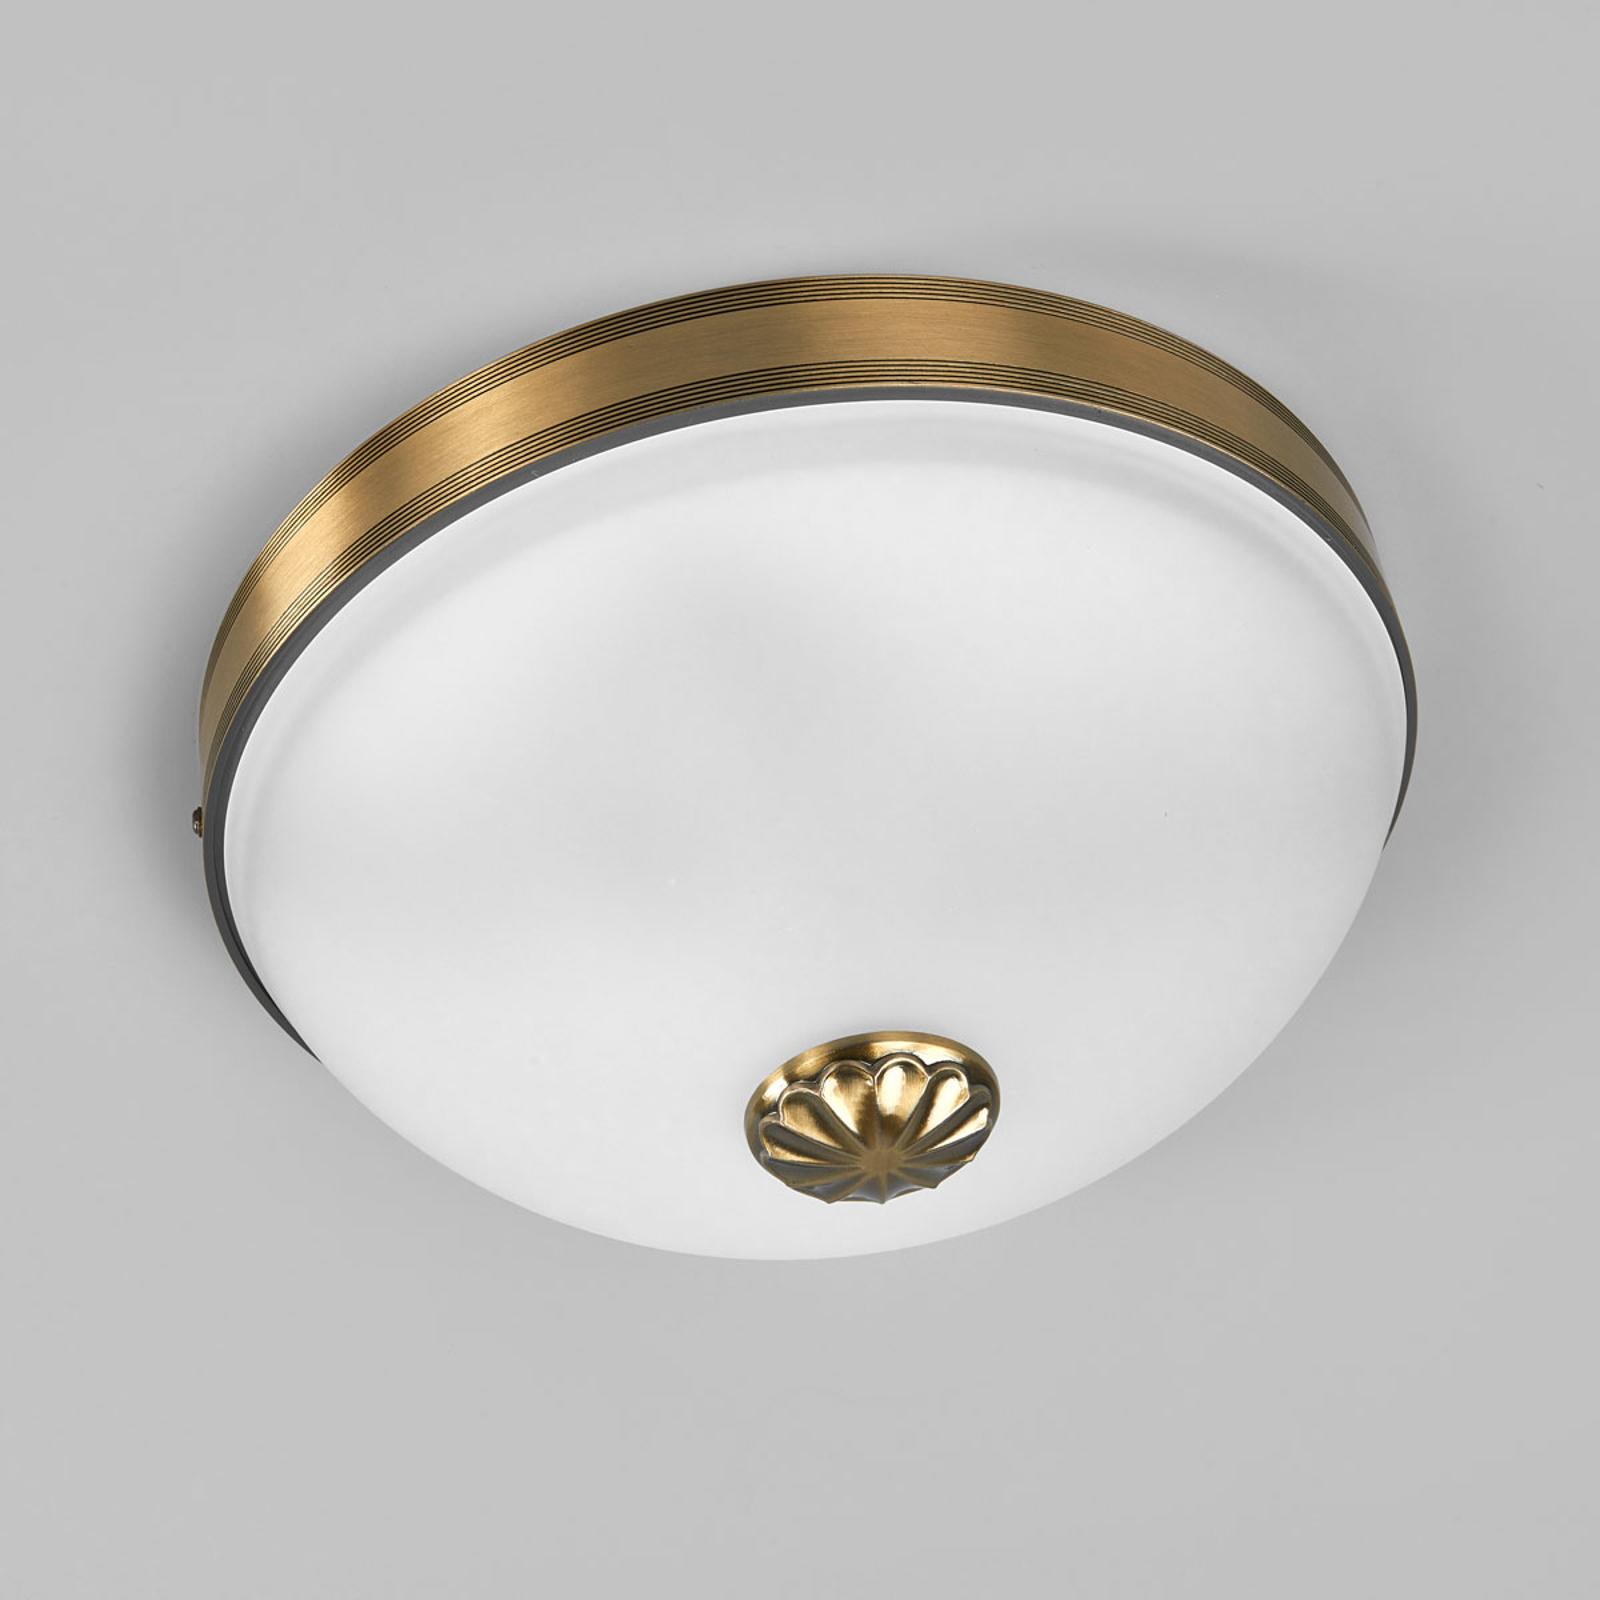 Smuk Impery loftlampe i antik stil